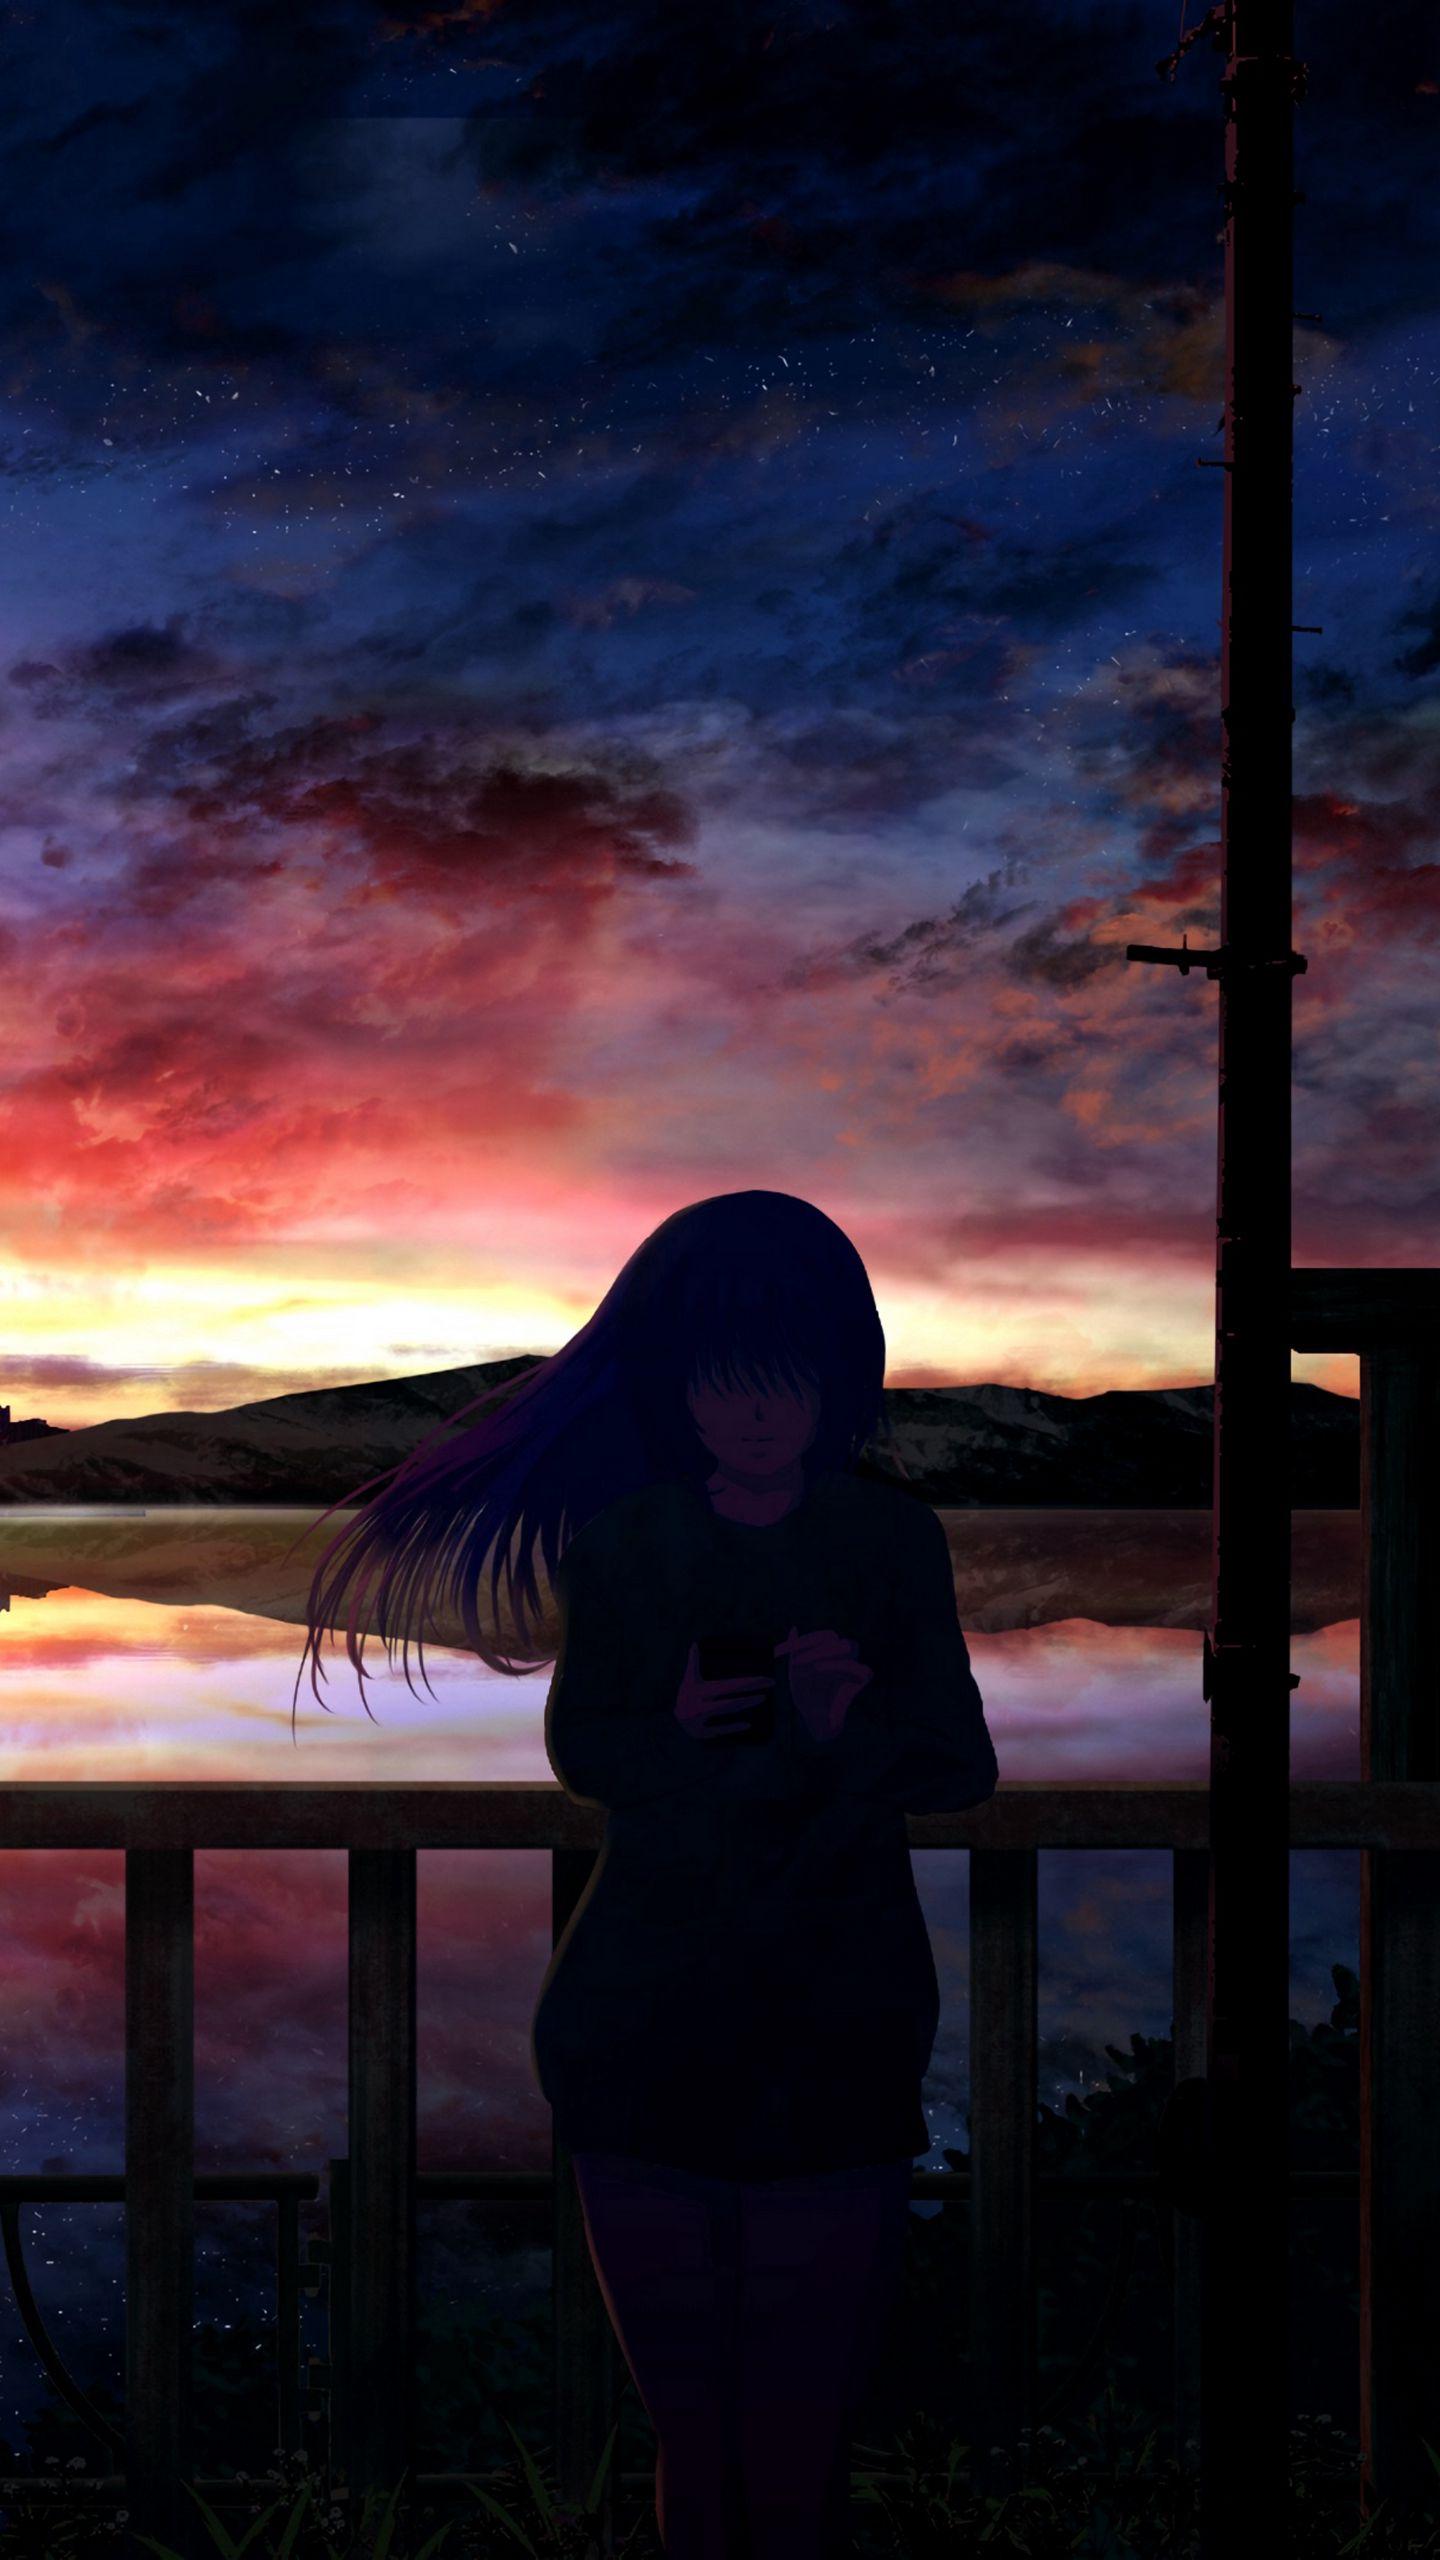 1440x2560 Wallpaper silhouette, night, starry sky, girl, anime